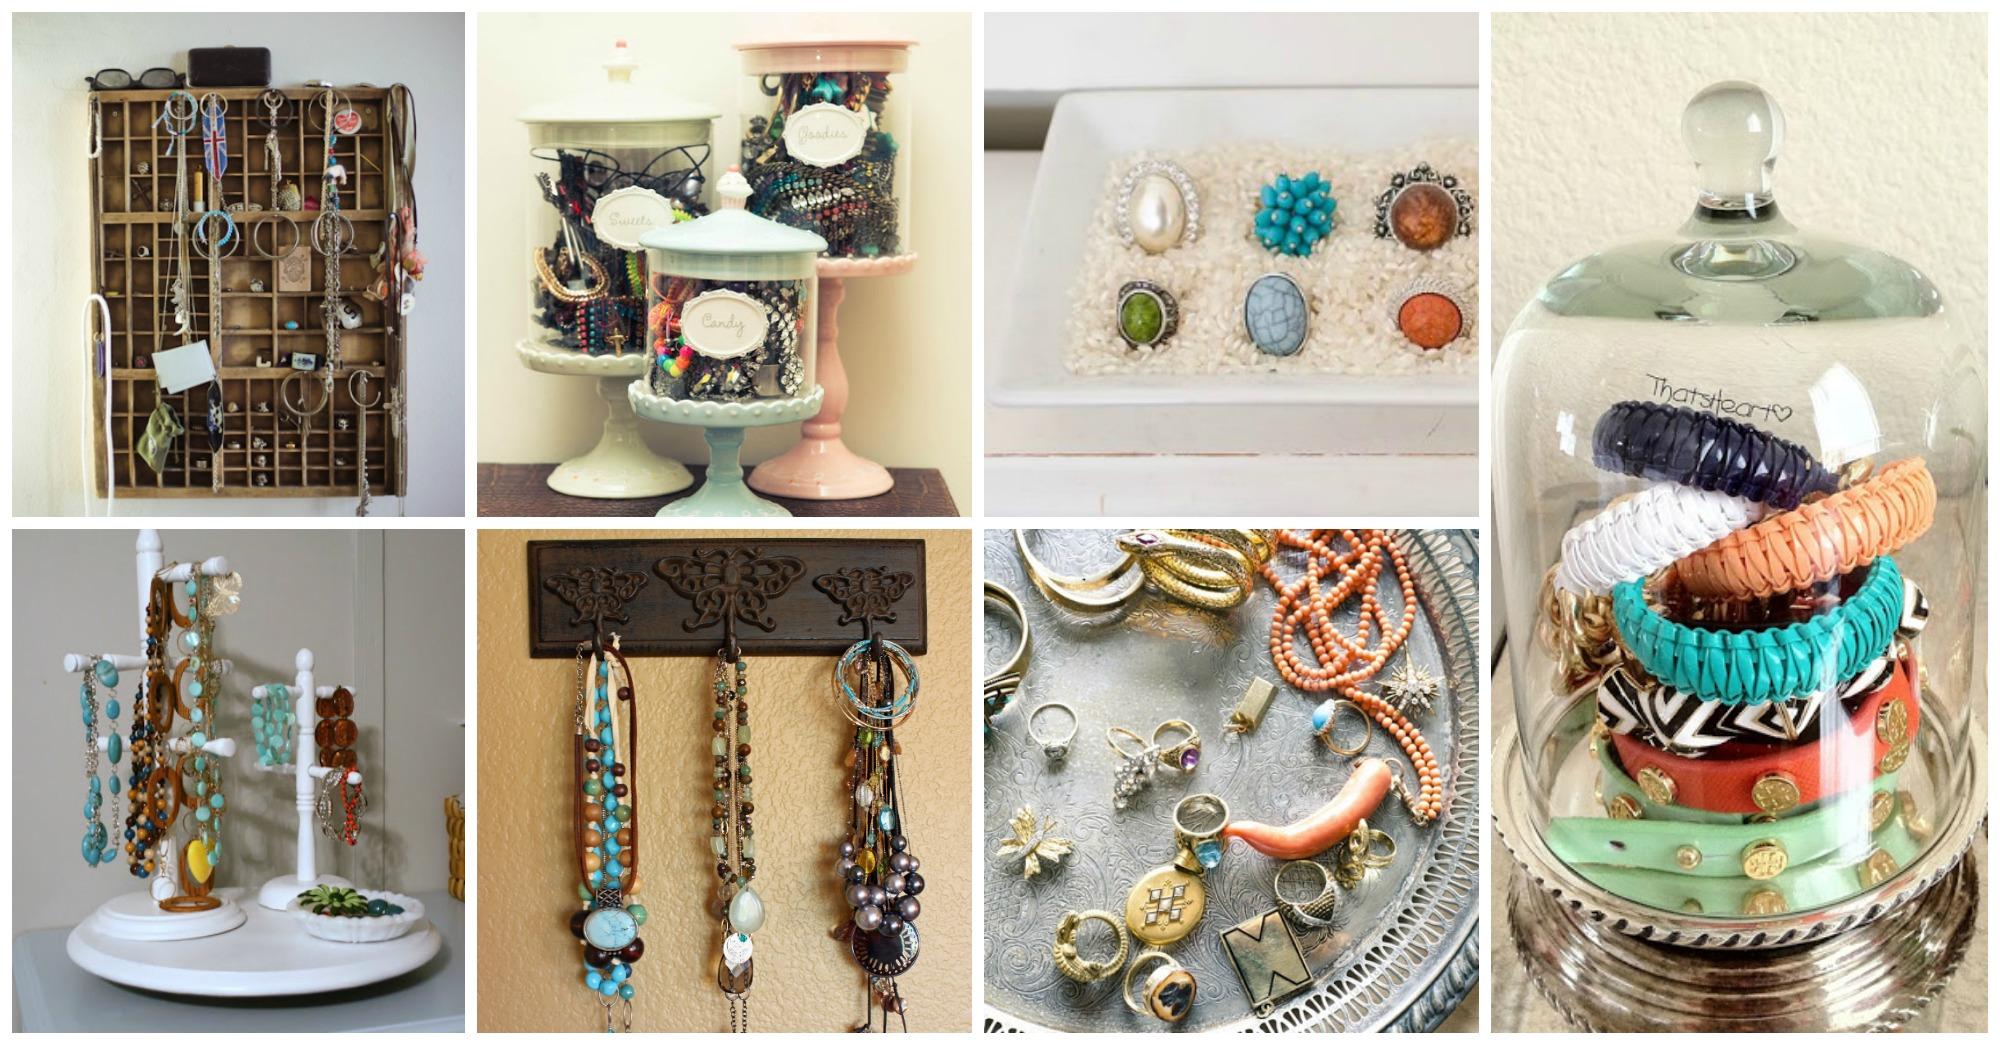 18 Fascinating Jewelry Storage Ideas That Will Amaze You